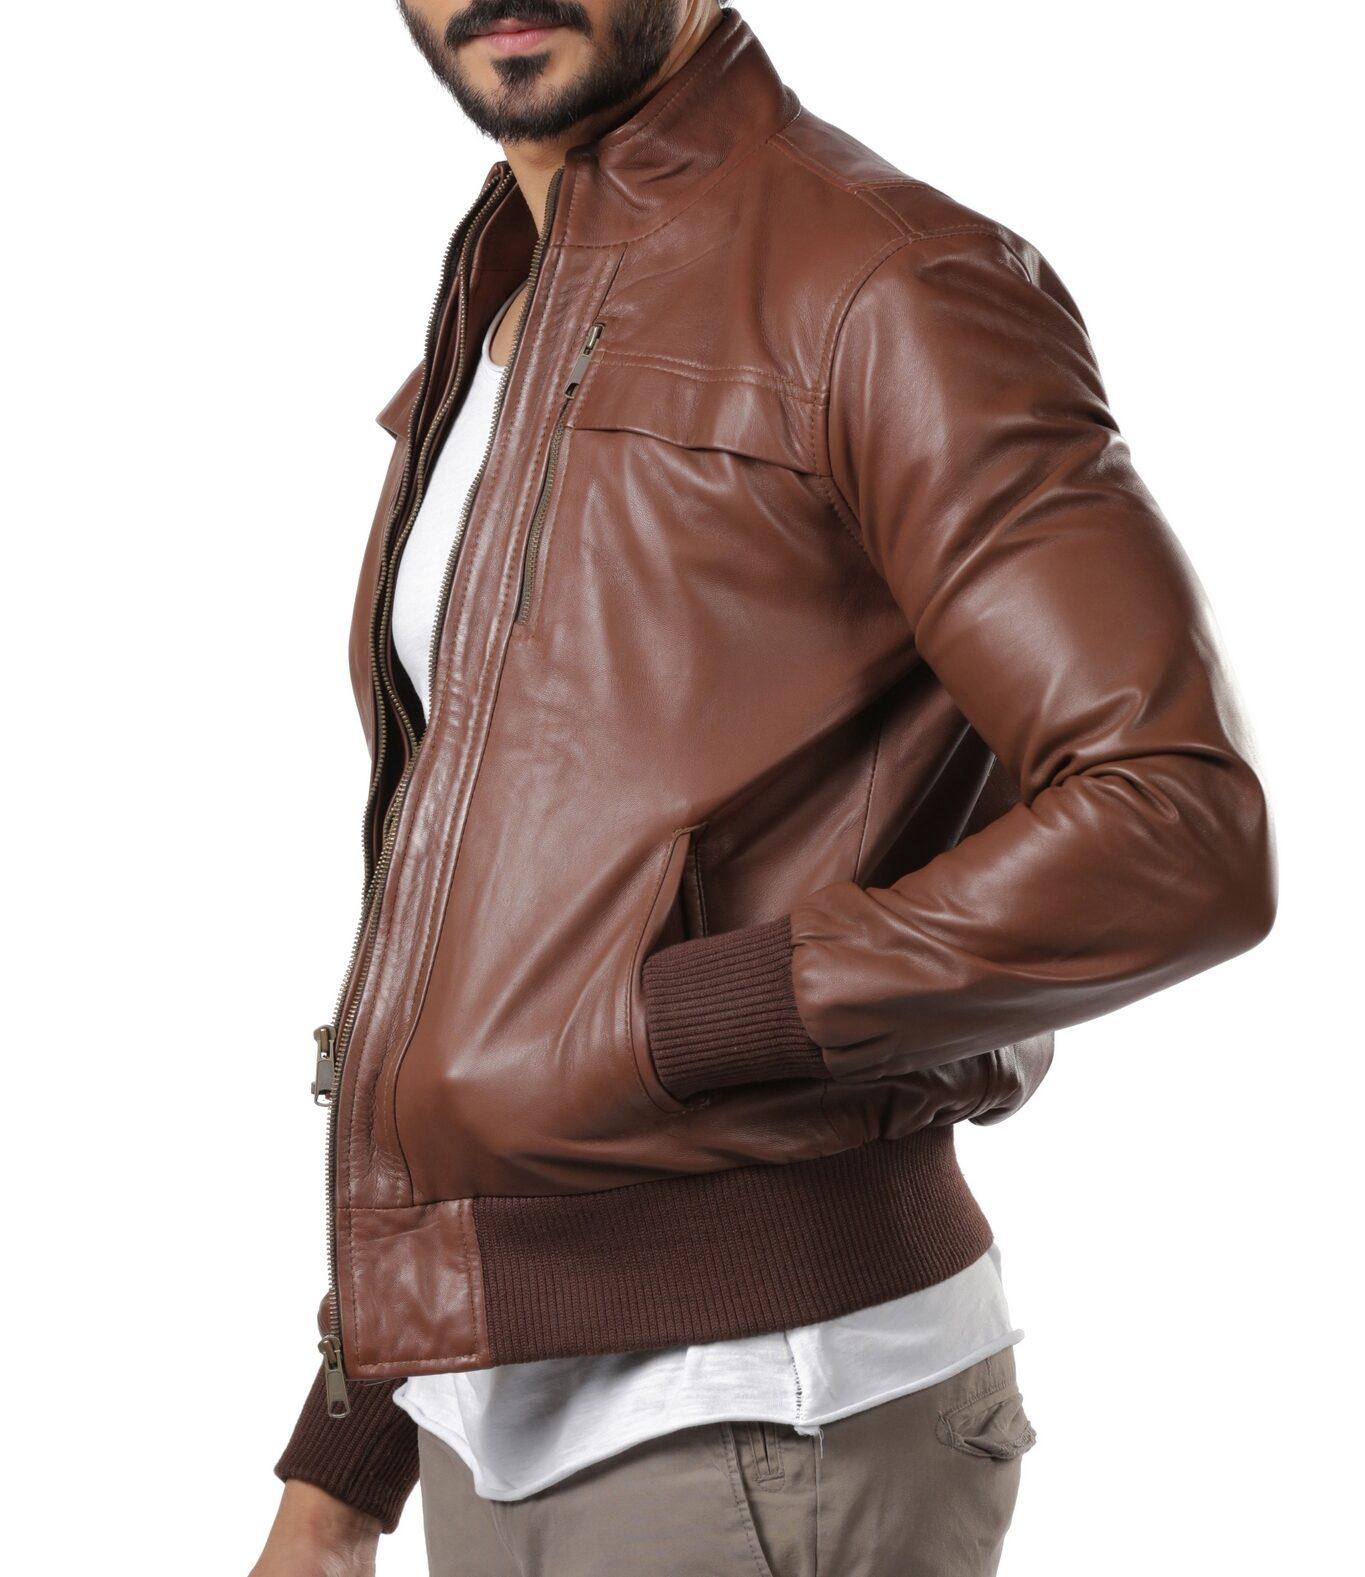 Zach Slim Fit Leather Jacket